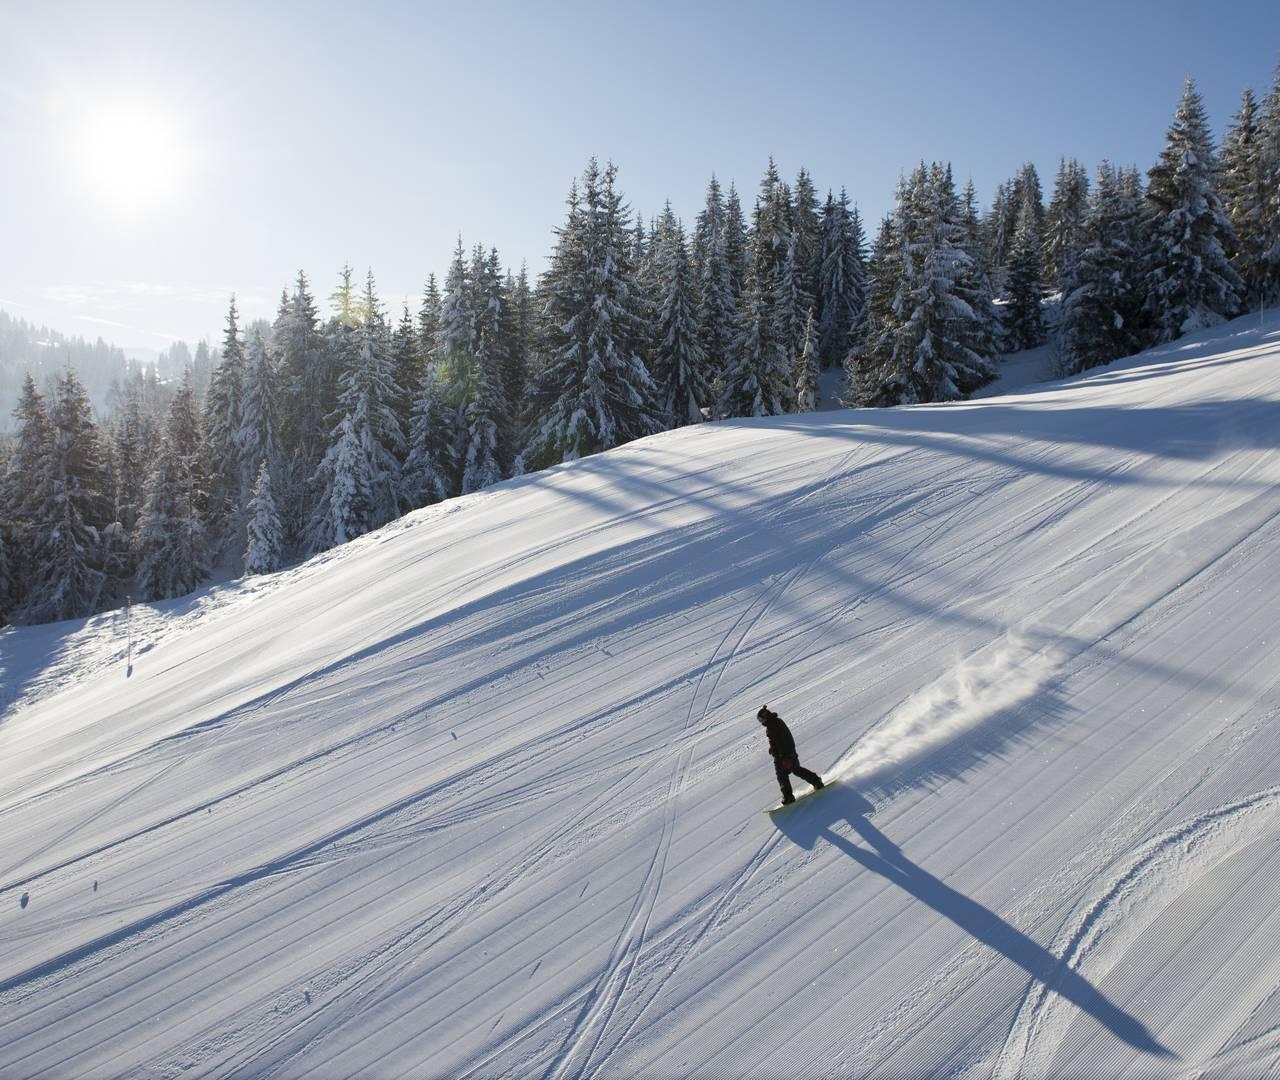 snowy slope ski les gets